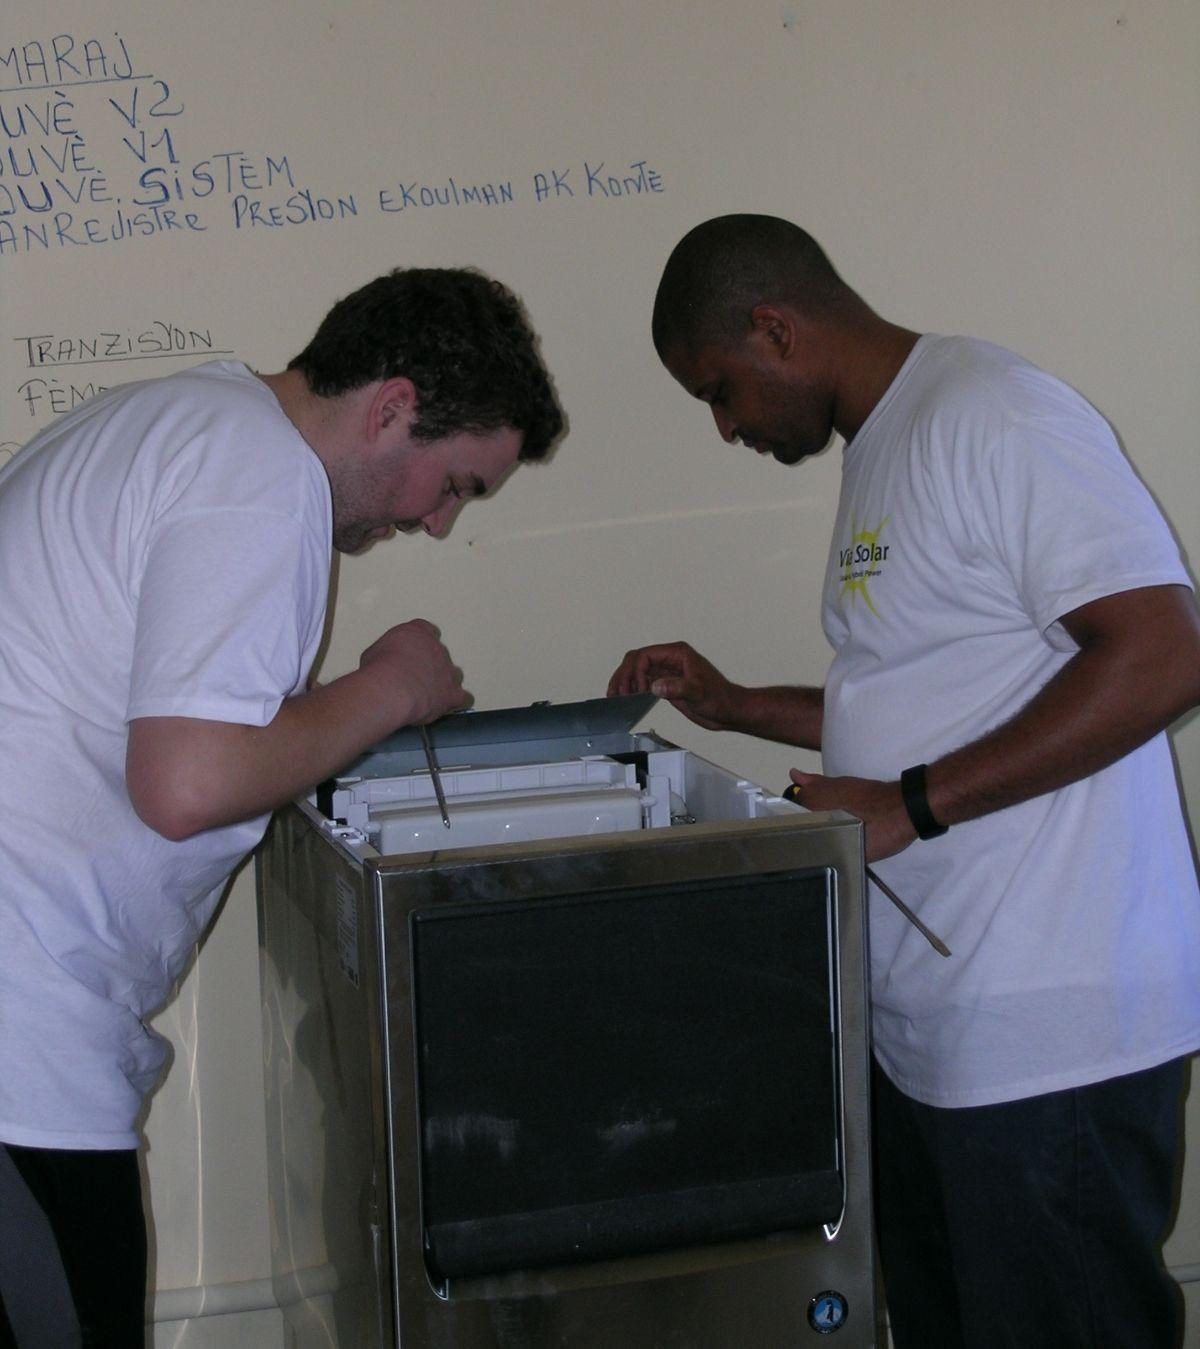 Hunterdon church members help Preservation Earth Project expand solar energy in Haiti